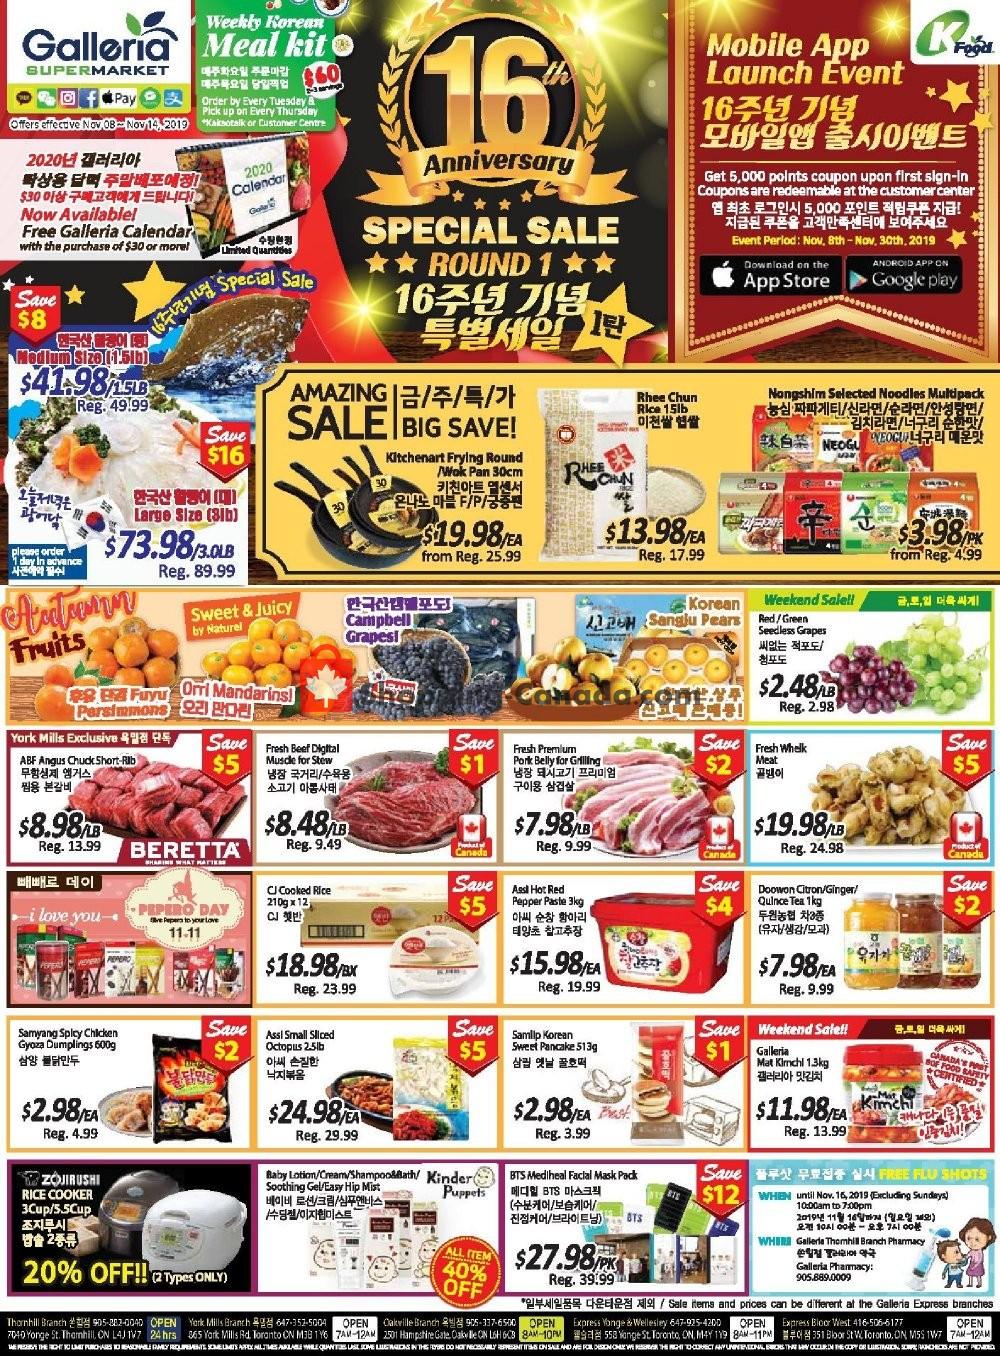 Flyer Galleria Supermarket Canada - from Friday November 8, 2019 to Thursday November 21, 2019